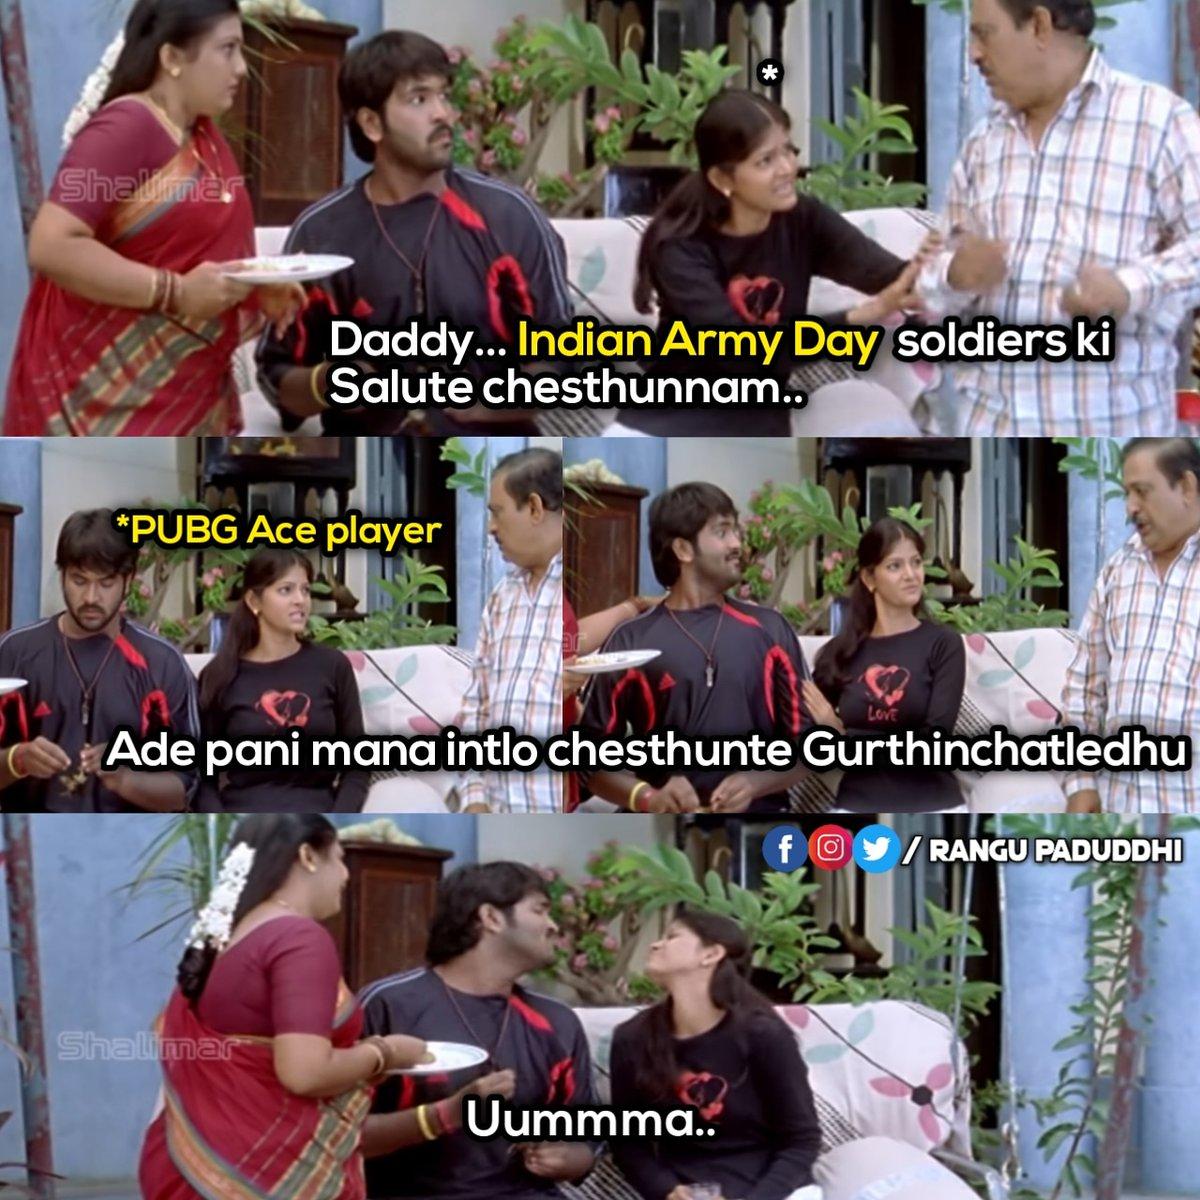 Show some bloody respect to the PUBG soldiers  For more fun Do follow - @rangu_paduddhi #rangupaduddhi #comedy #fun #memes #memesdaily #telugumemes #trolls #telugumeme #telugucomedy #btech #babunuvvubtechah #btechlife #btechjokes  #backbenchers  #PUBG #pubglovers #pubgmobilepic.twitter.com/GmPKO2Pd80